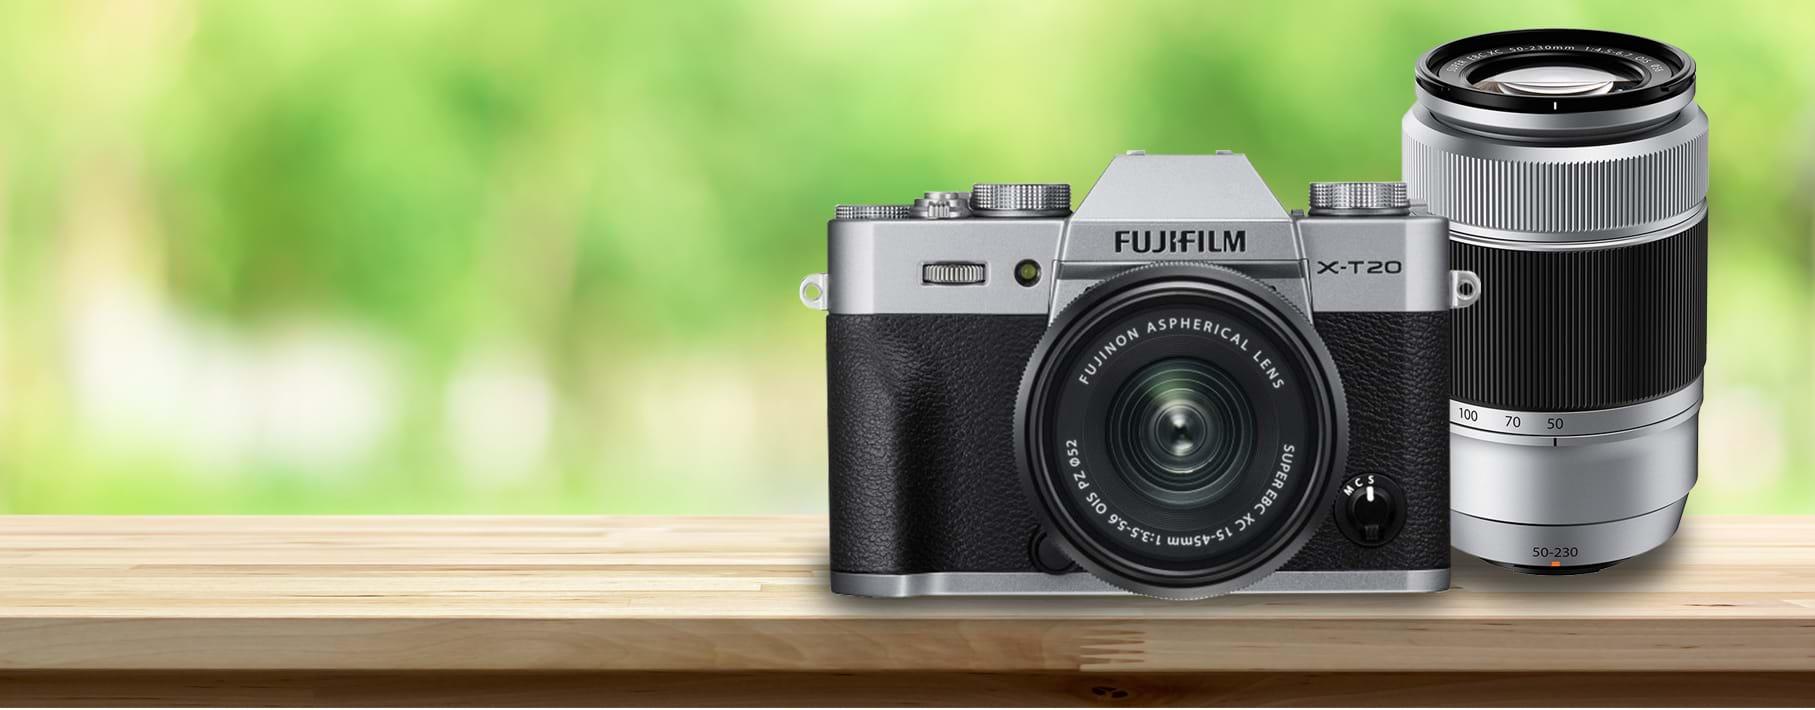 fuji X-t20 - Dad